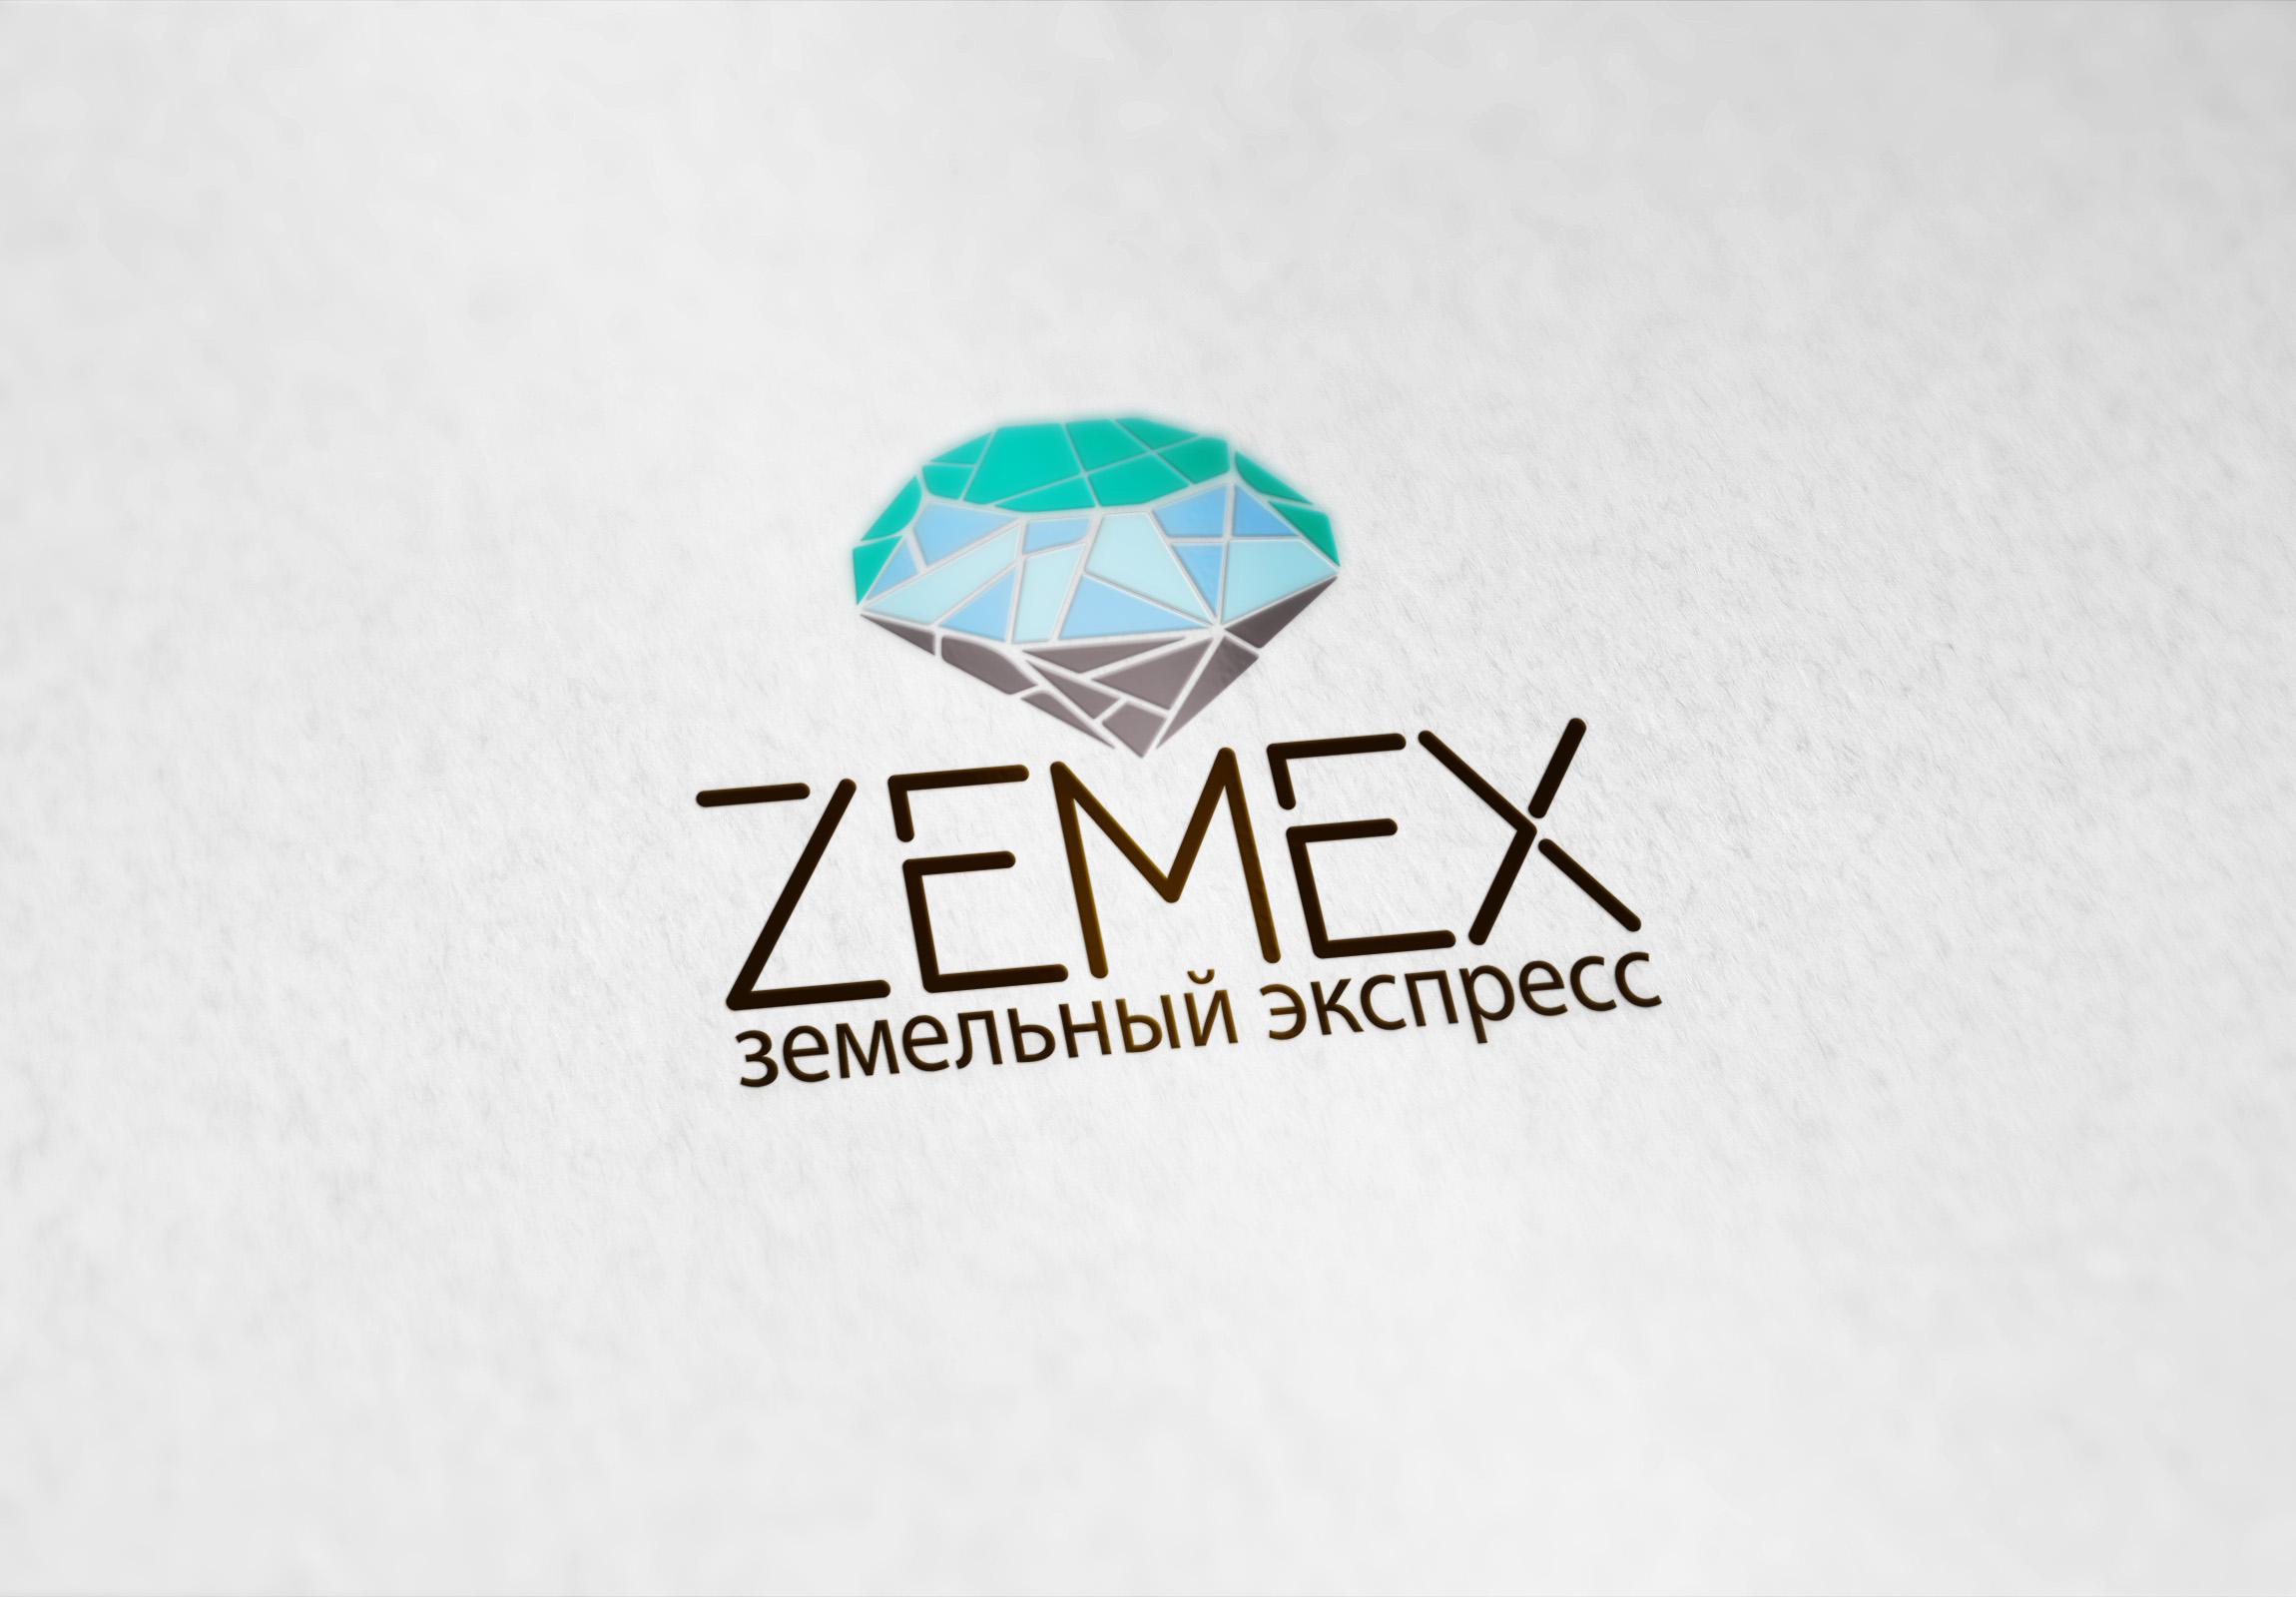 Создание логотипа и фирменного стиля фото f_01959ee620fa5bdd.jpg